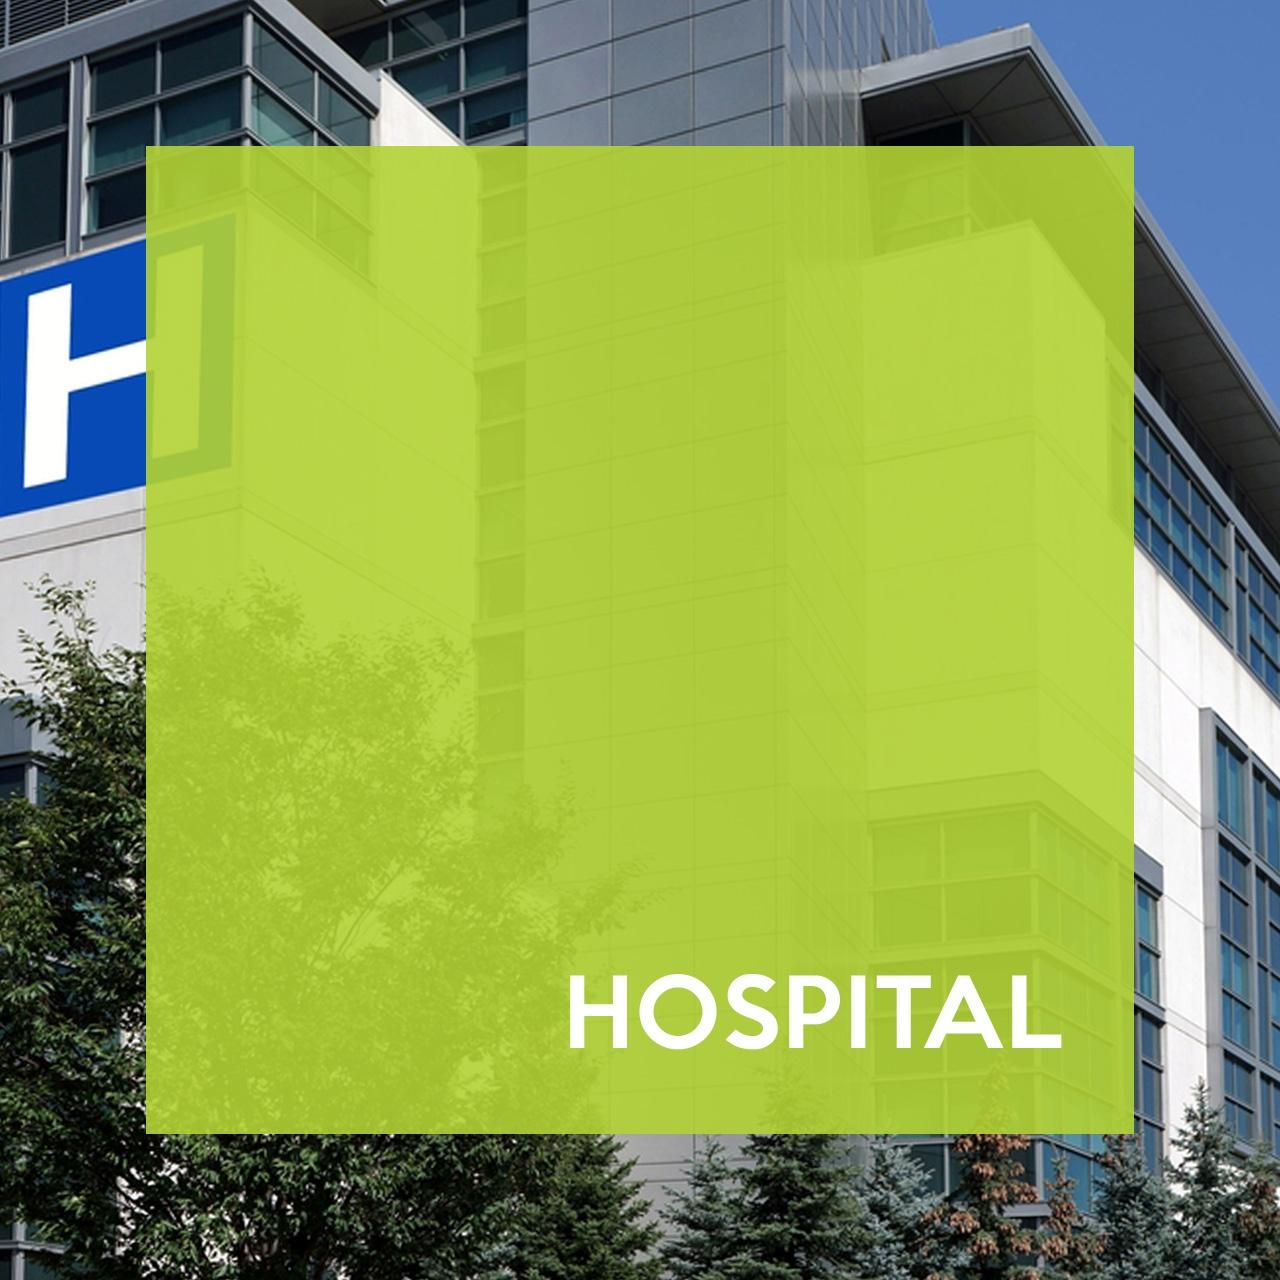 AMI_COMMERCIAL__hospital_-_019.jpg